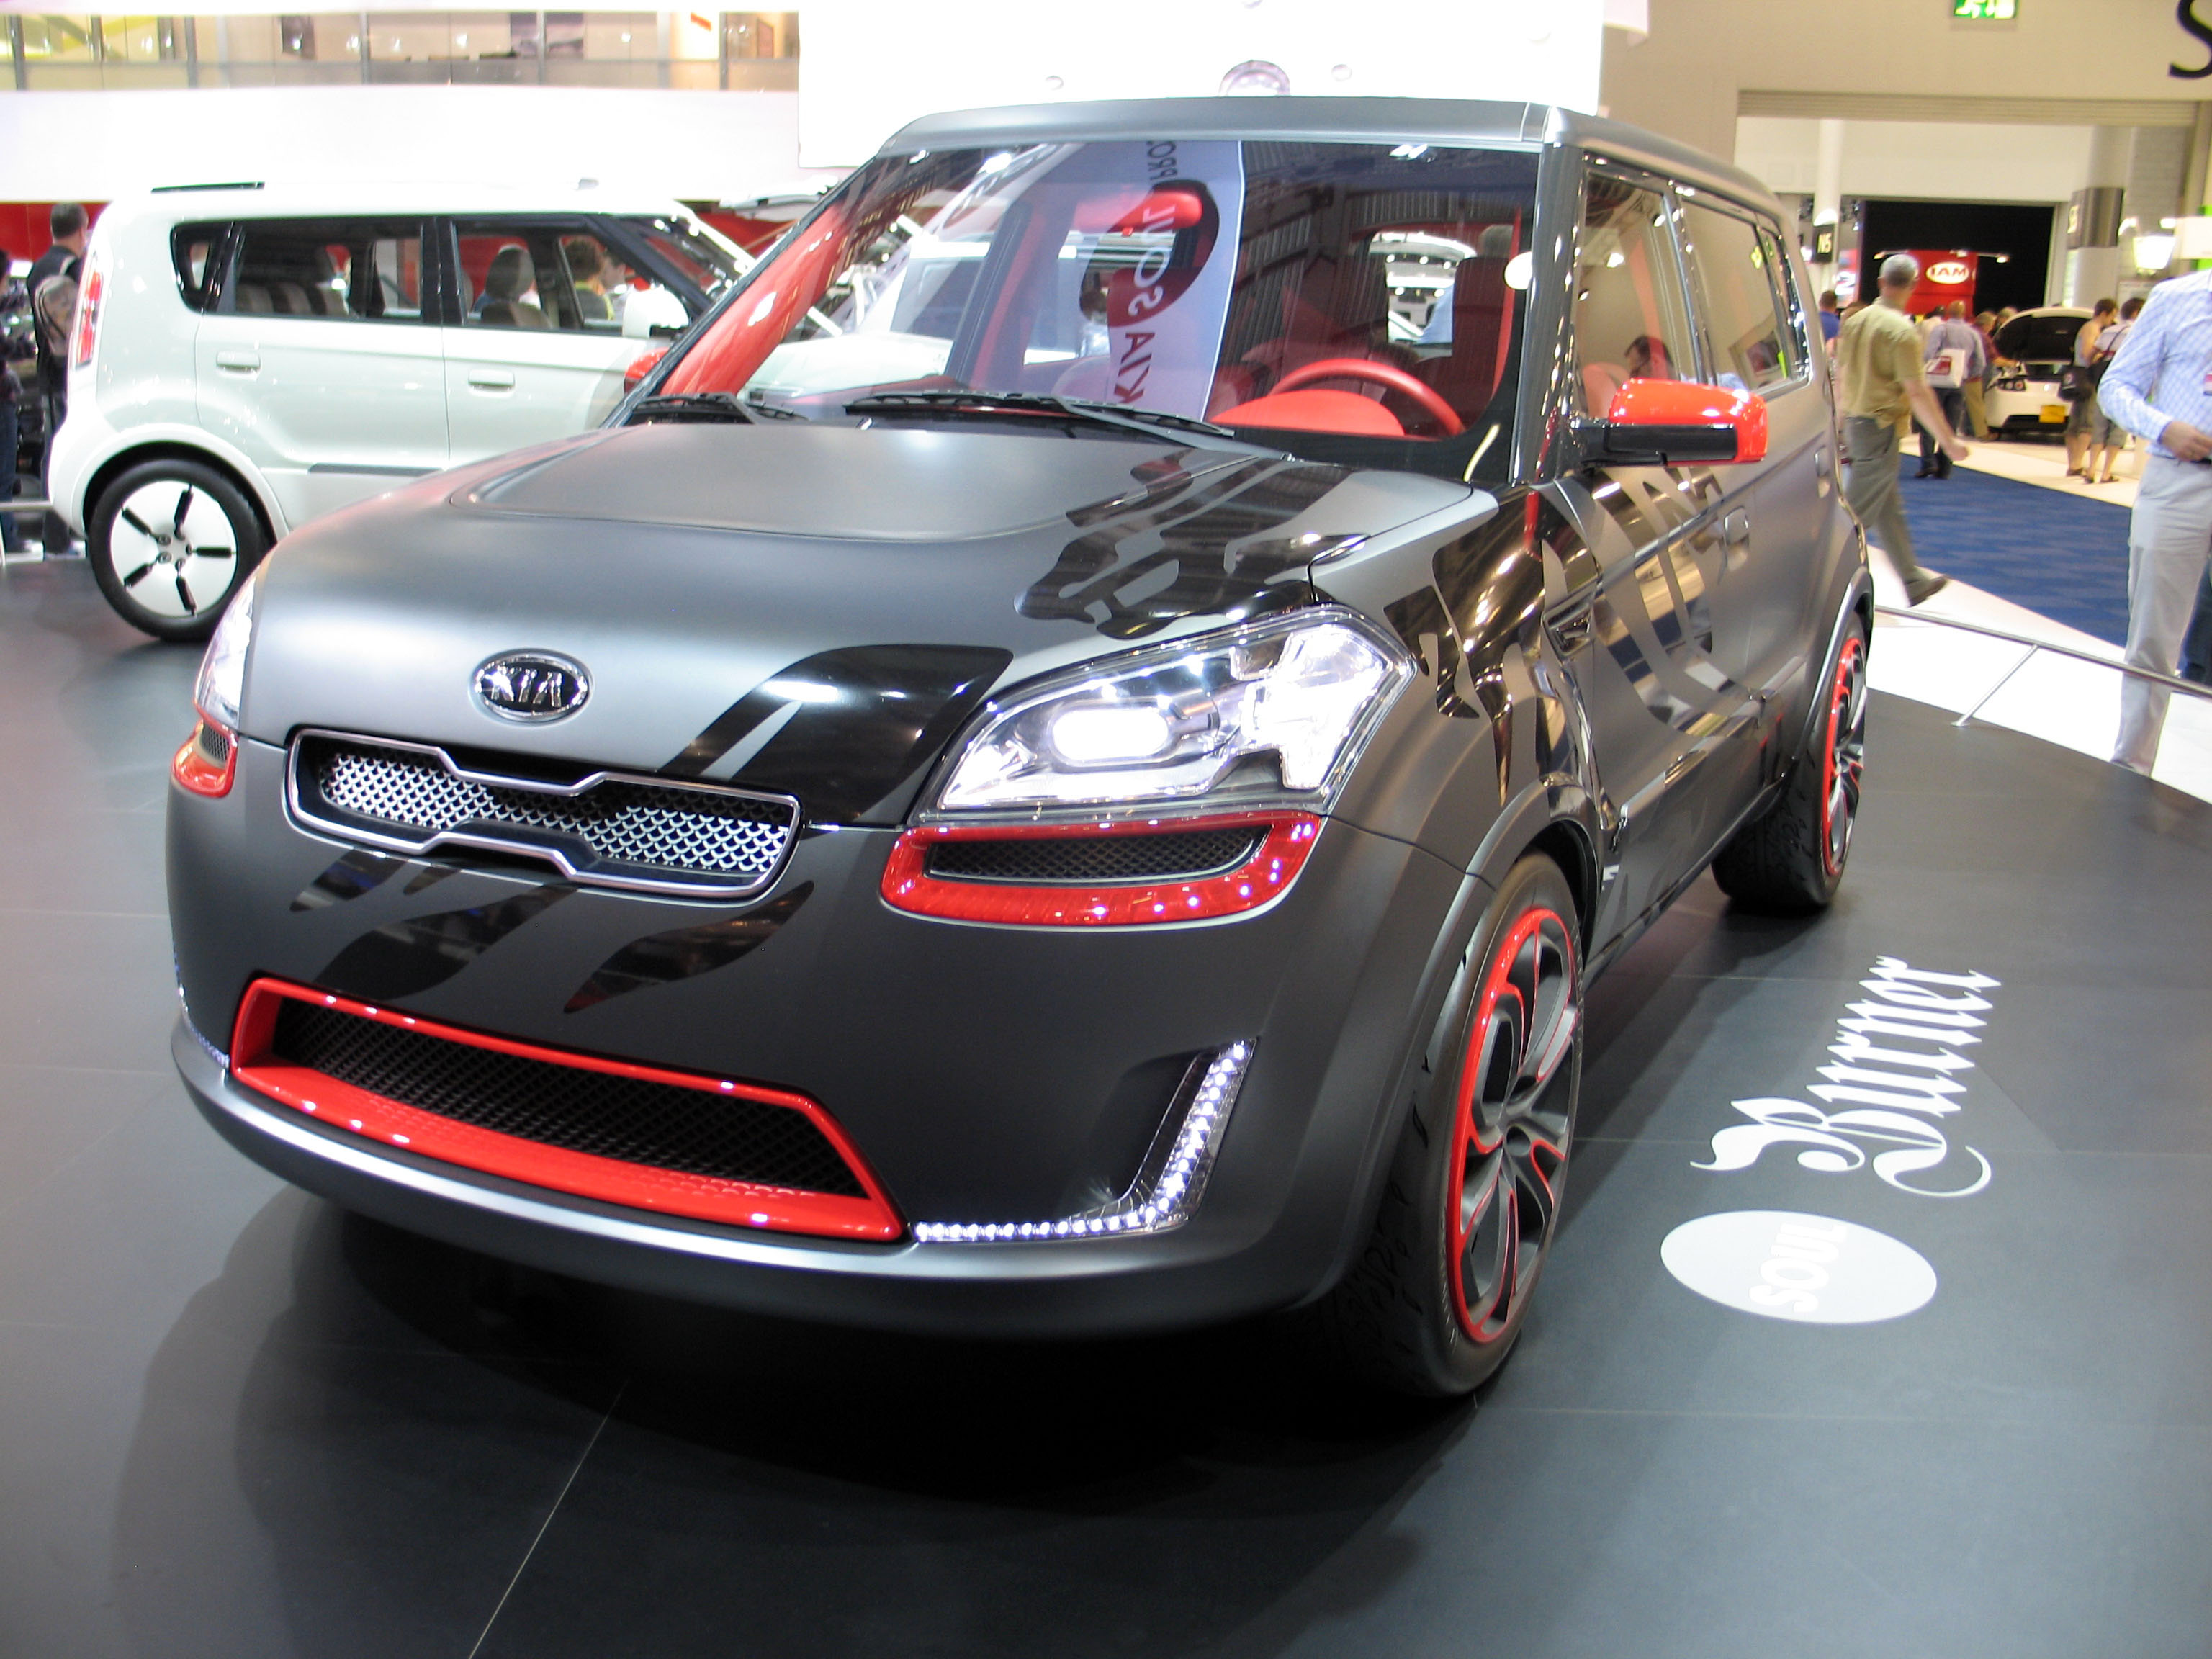 Kia Soul Concept Car